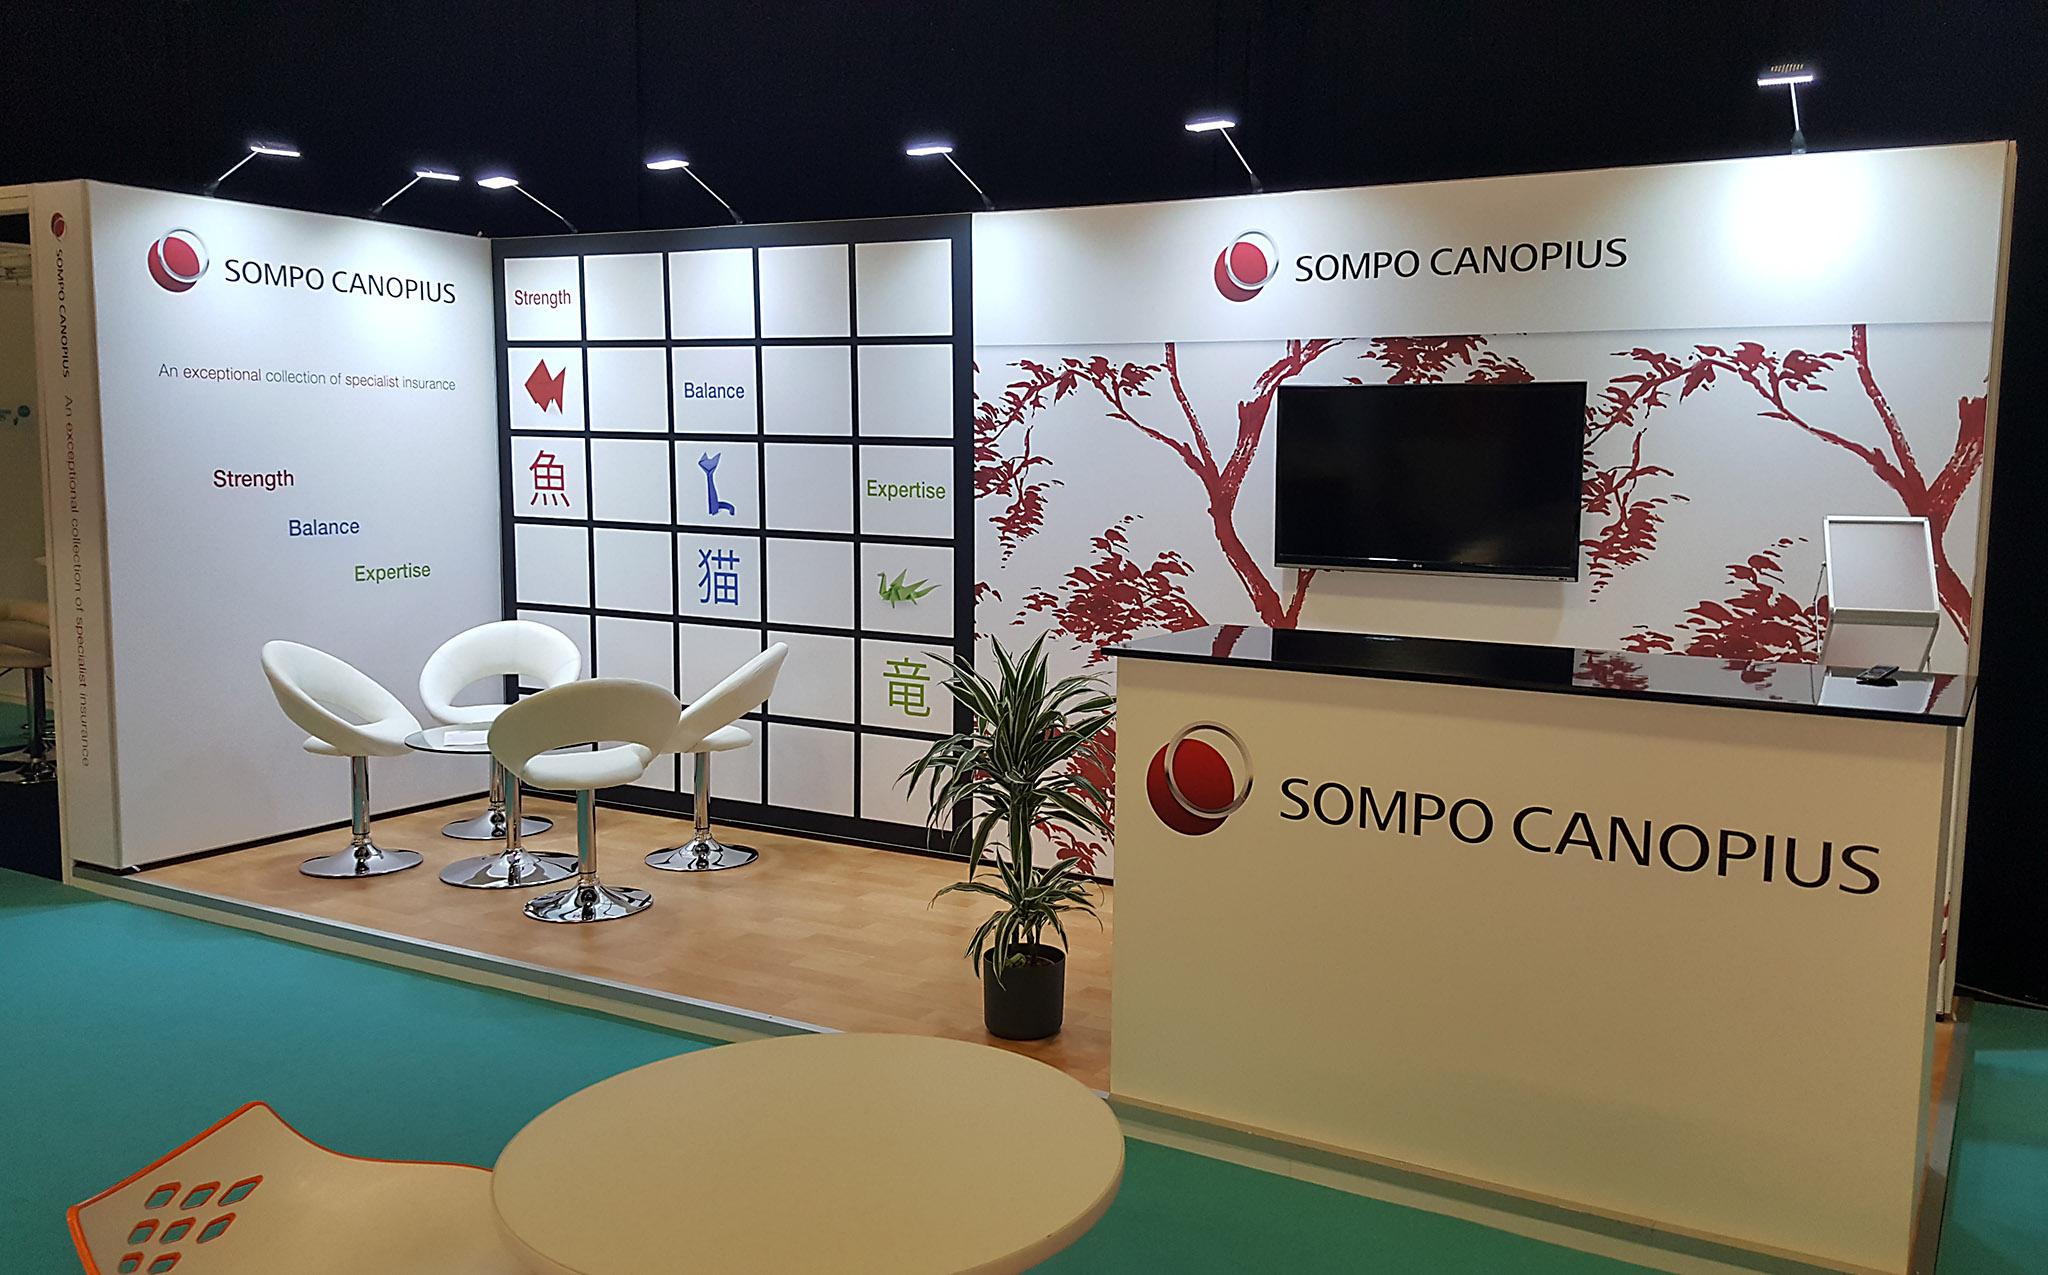 sompo-canopius-stand.jpg